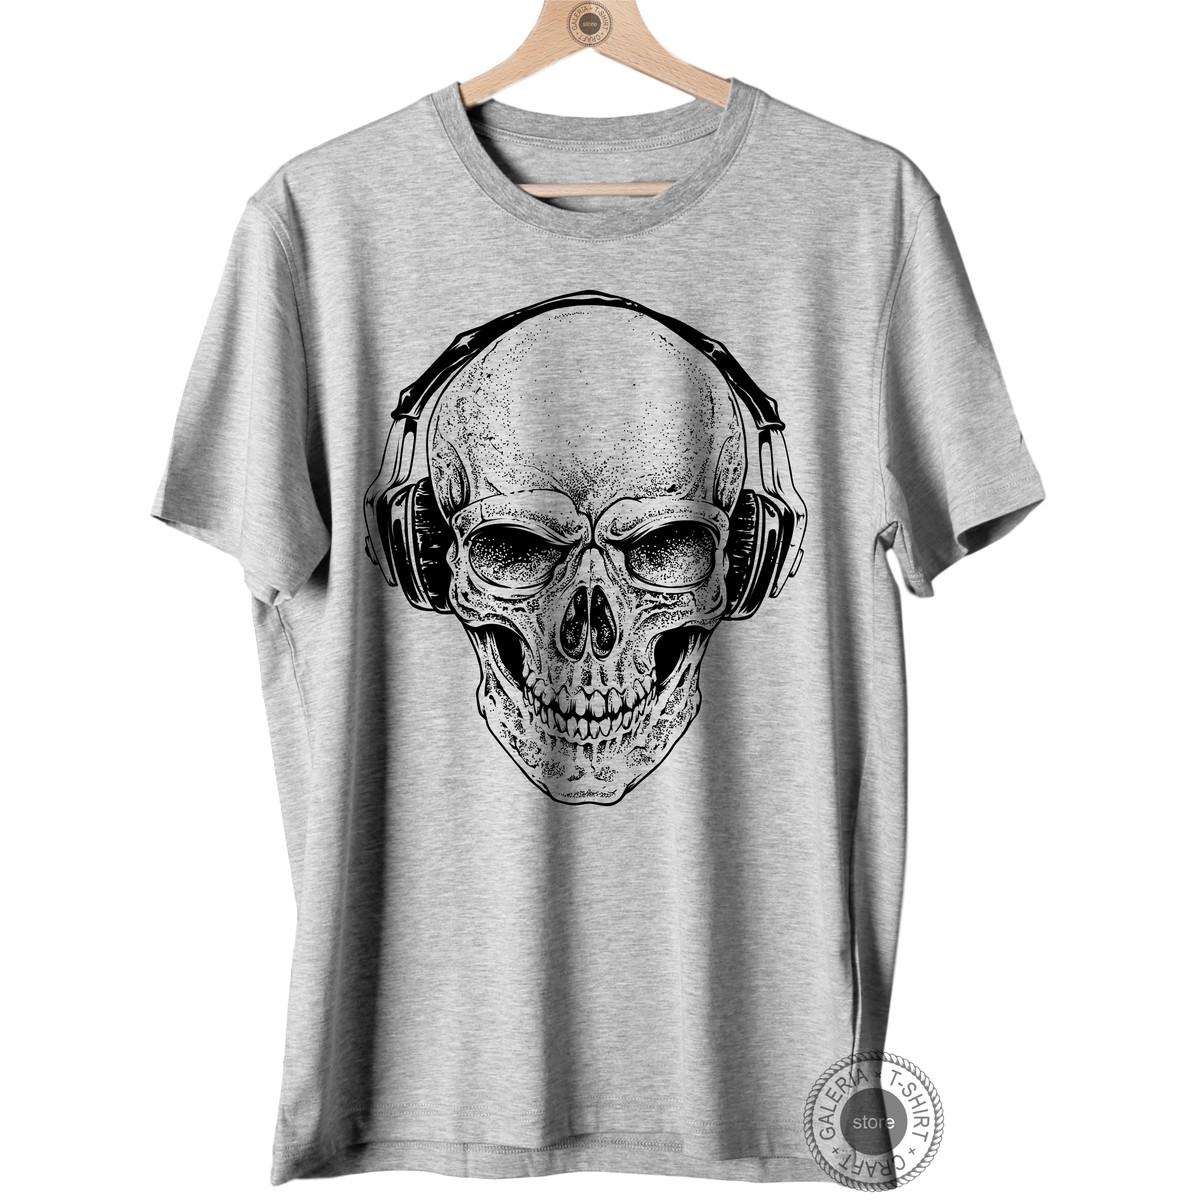 8b25aa7c32 Camisa Camiseta Masculina Caveira Skull Tattoo Fone no Elo7 ...